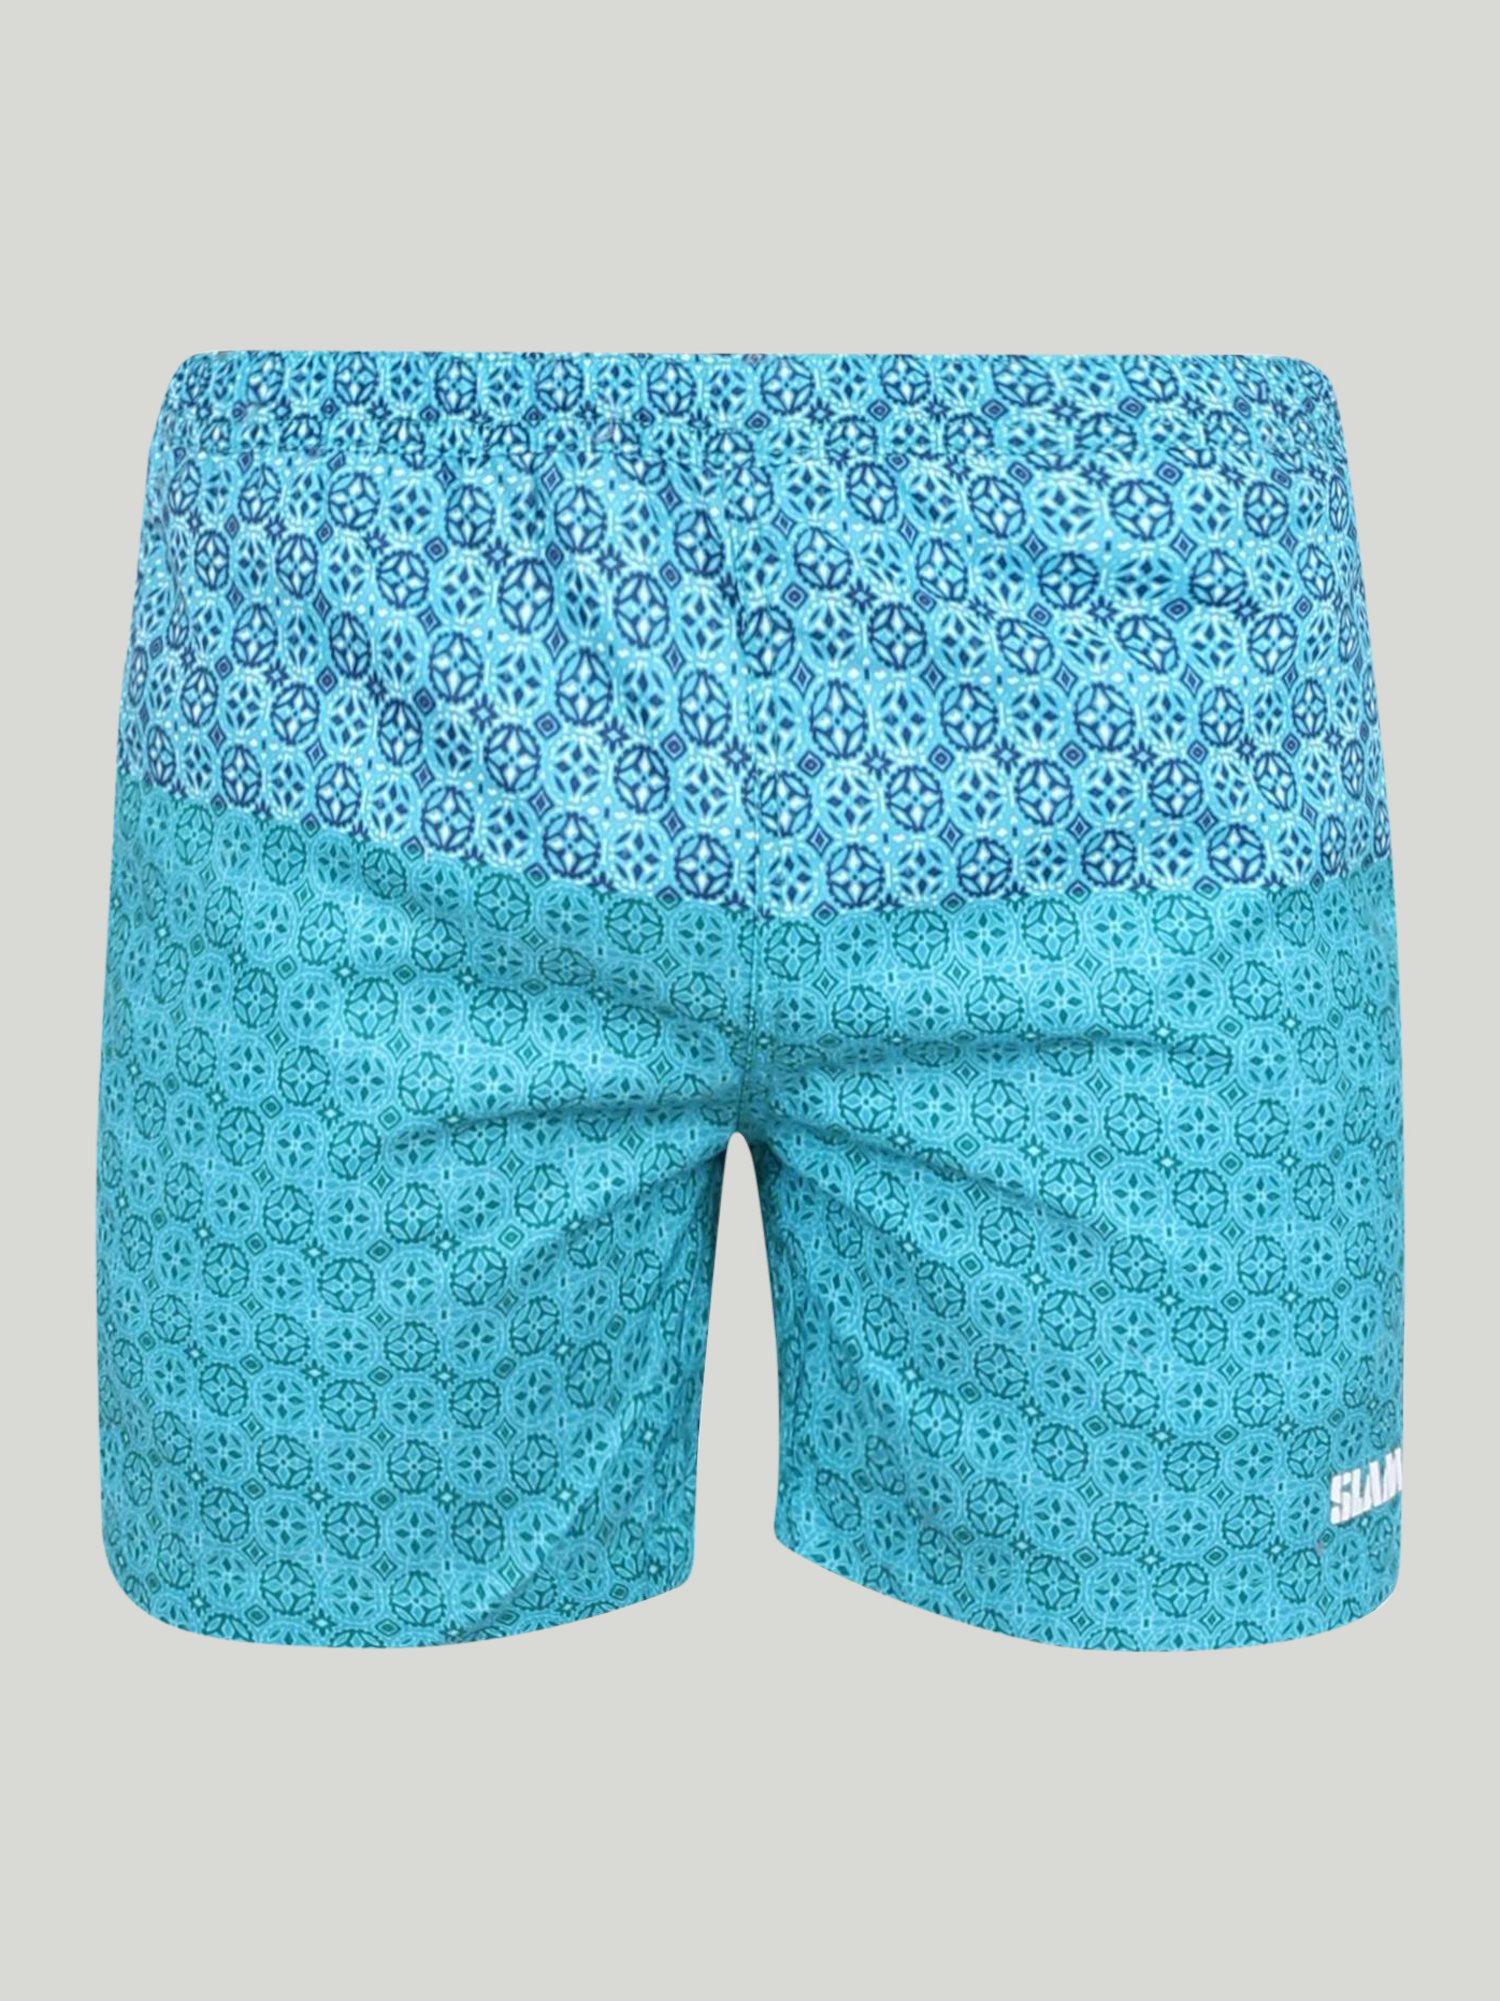 Swimsuit Viceversa - Azul Caribe